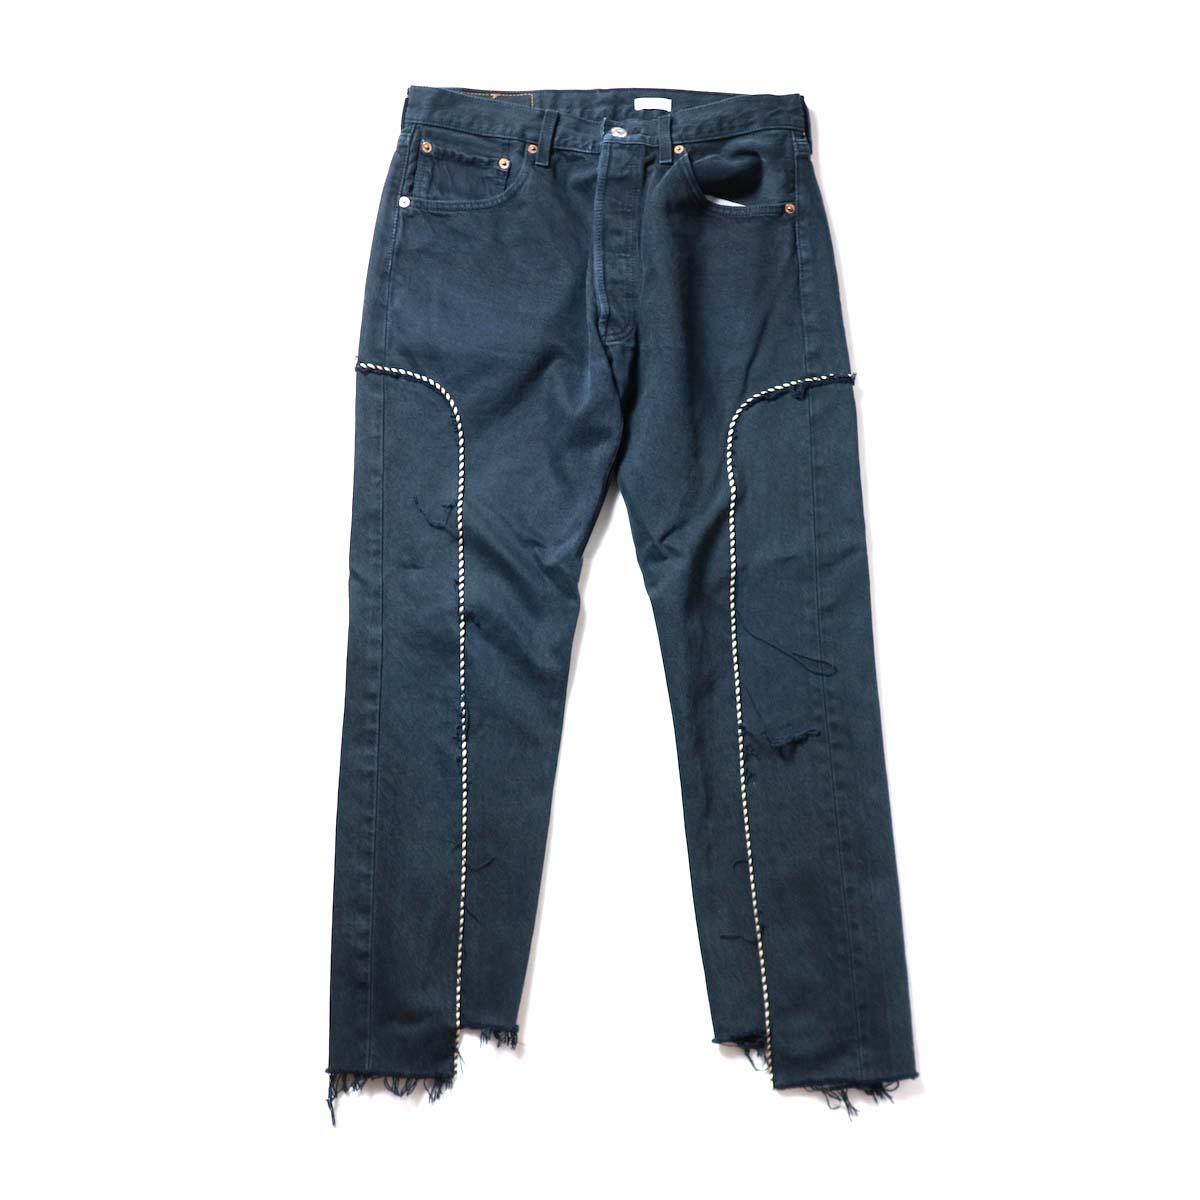 OLD PARK / Western Jeans Black (Msize-H)